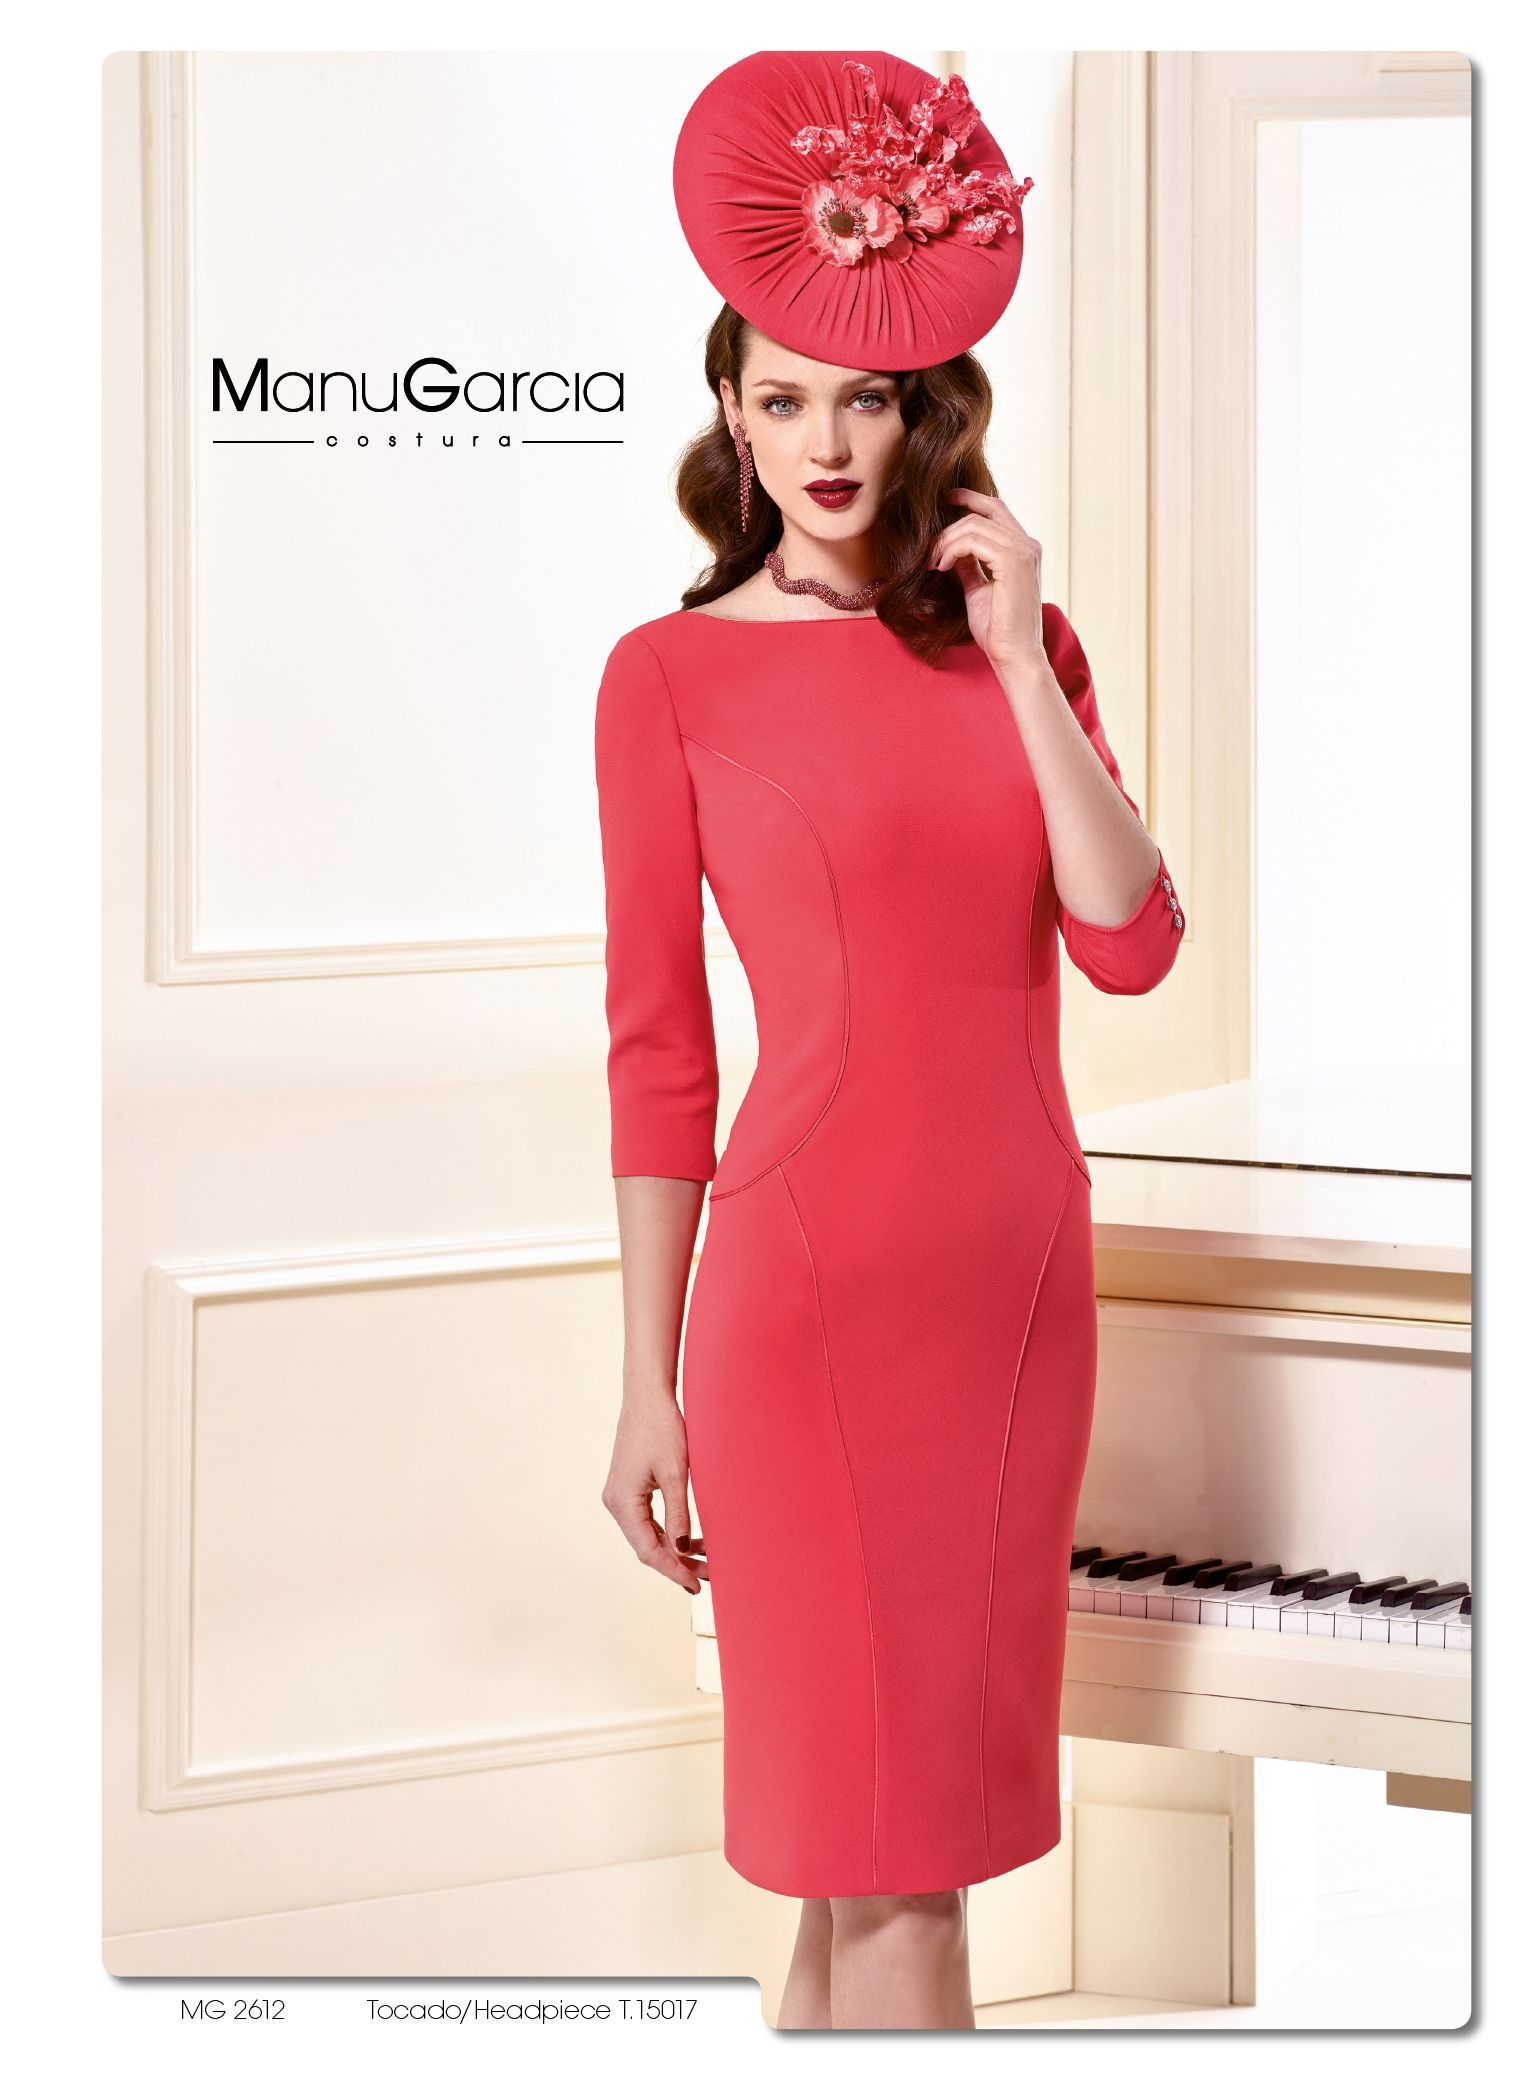 MG2612 - Party Dresses - Manu García - Weddingspot.co.uk